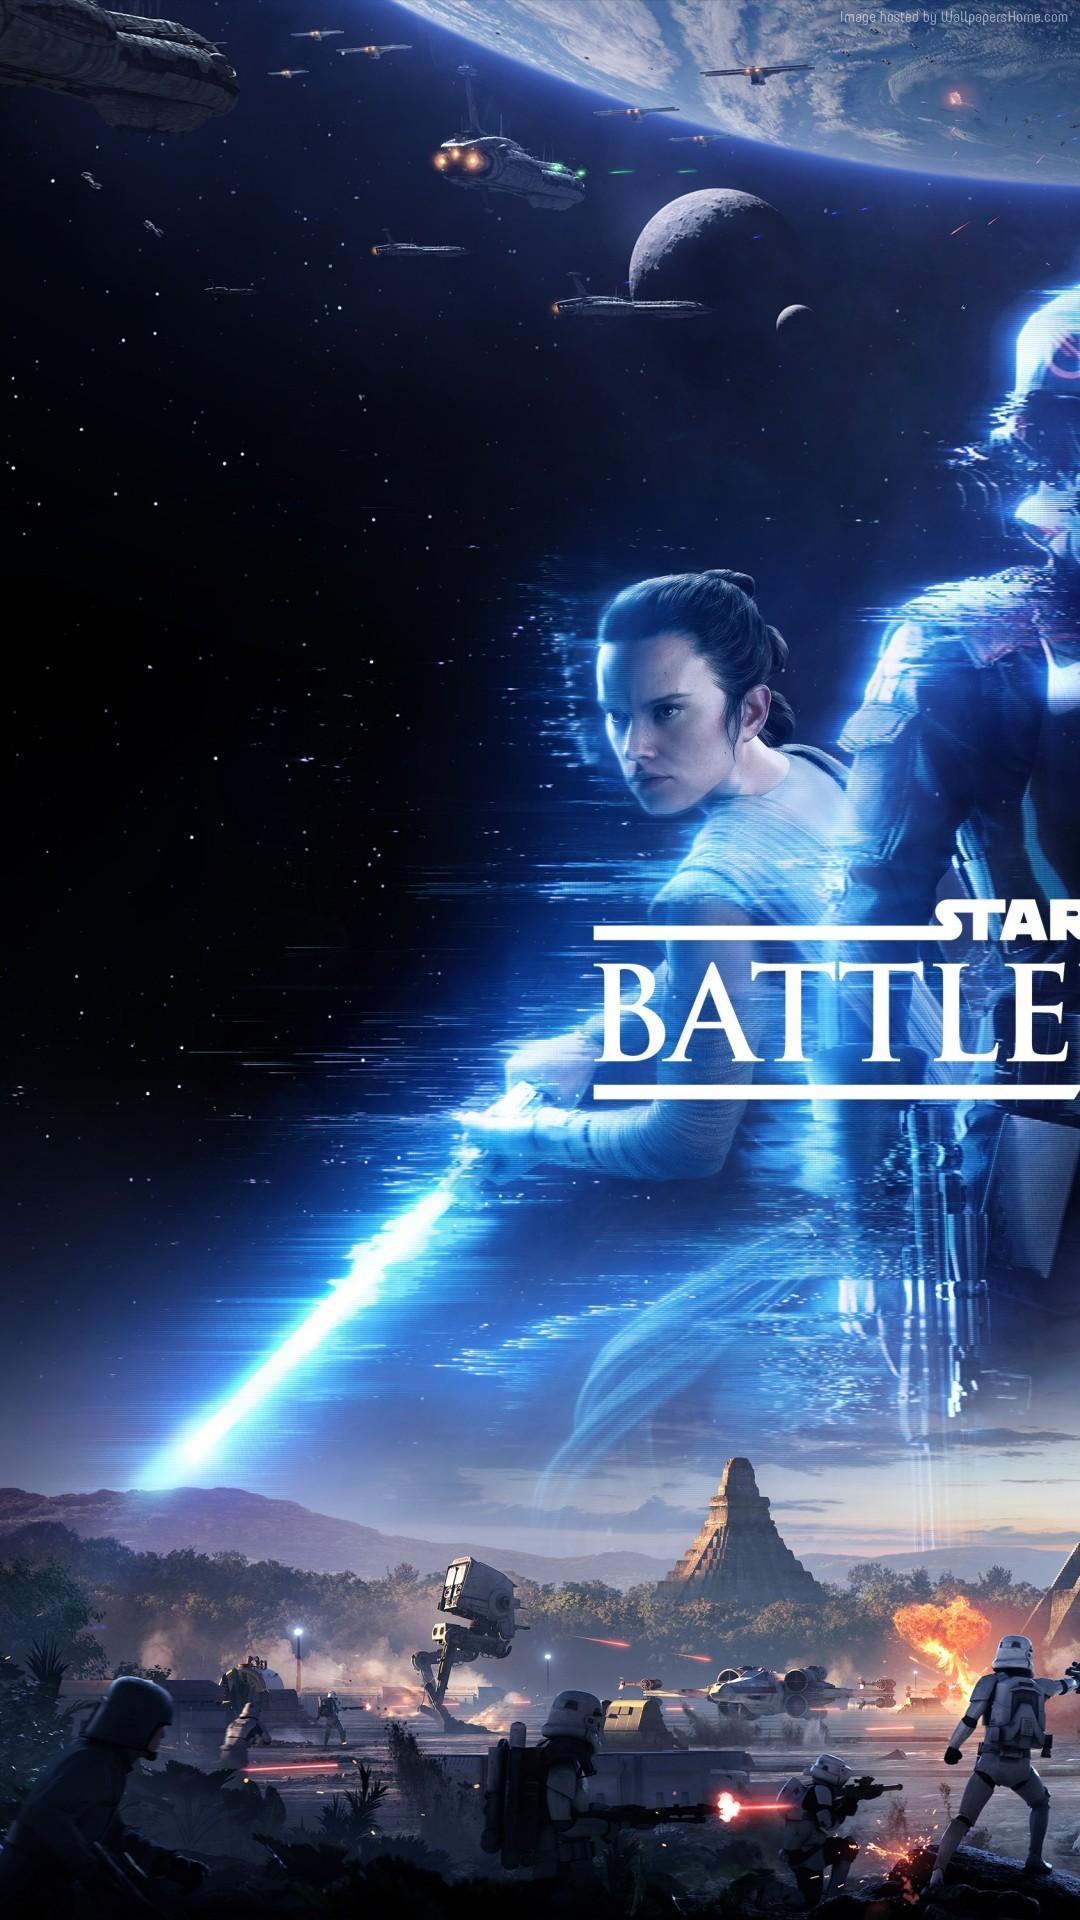 Star Wars Battlefield Wallpaper (70+ images)